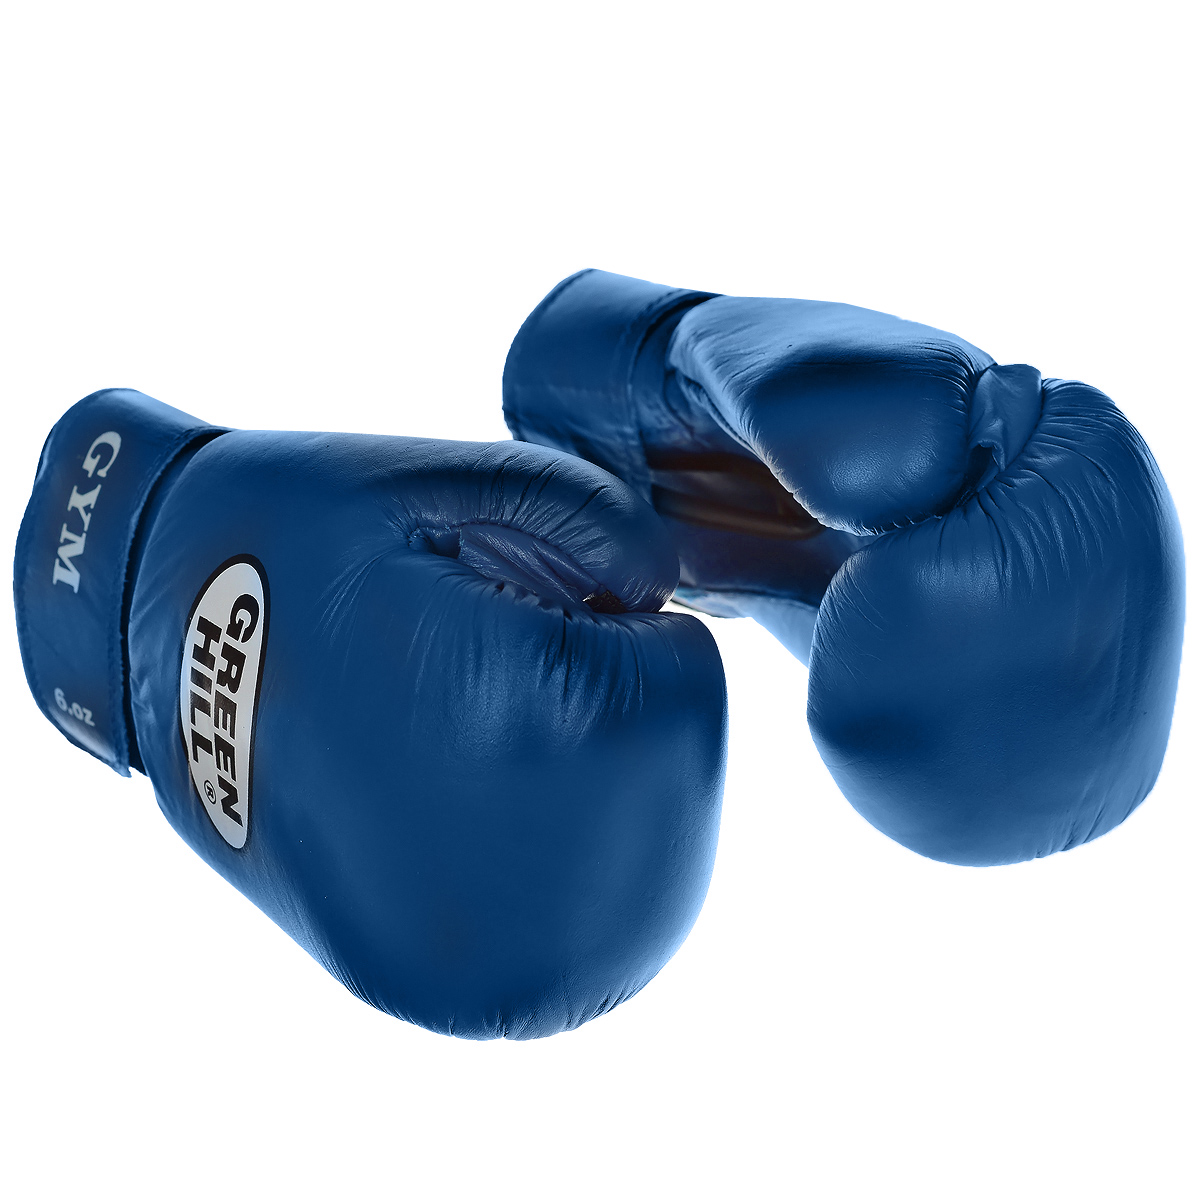 Перчатки боксерские Green Hill Gym, цвет: синий. Вес 6 унций